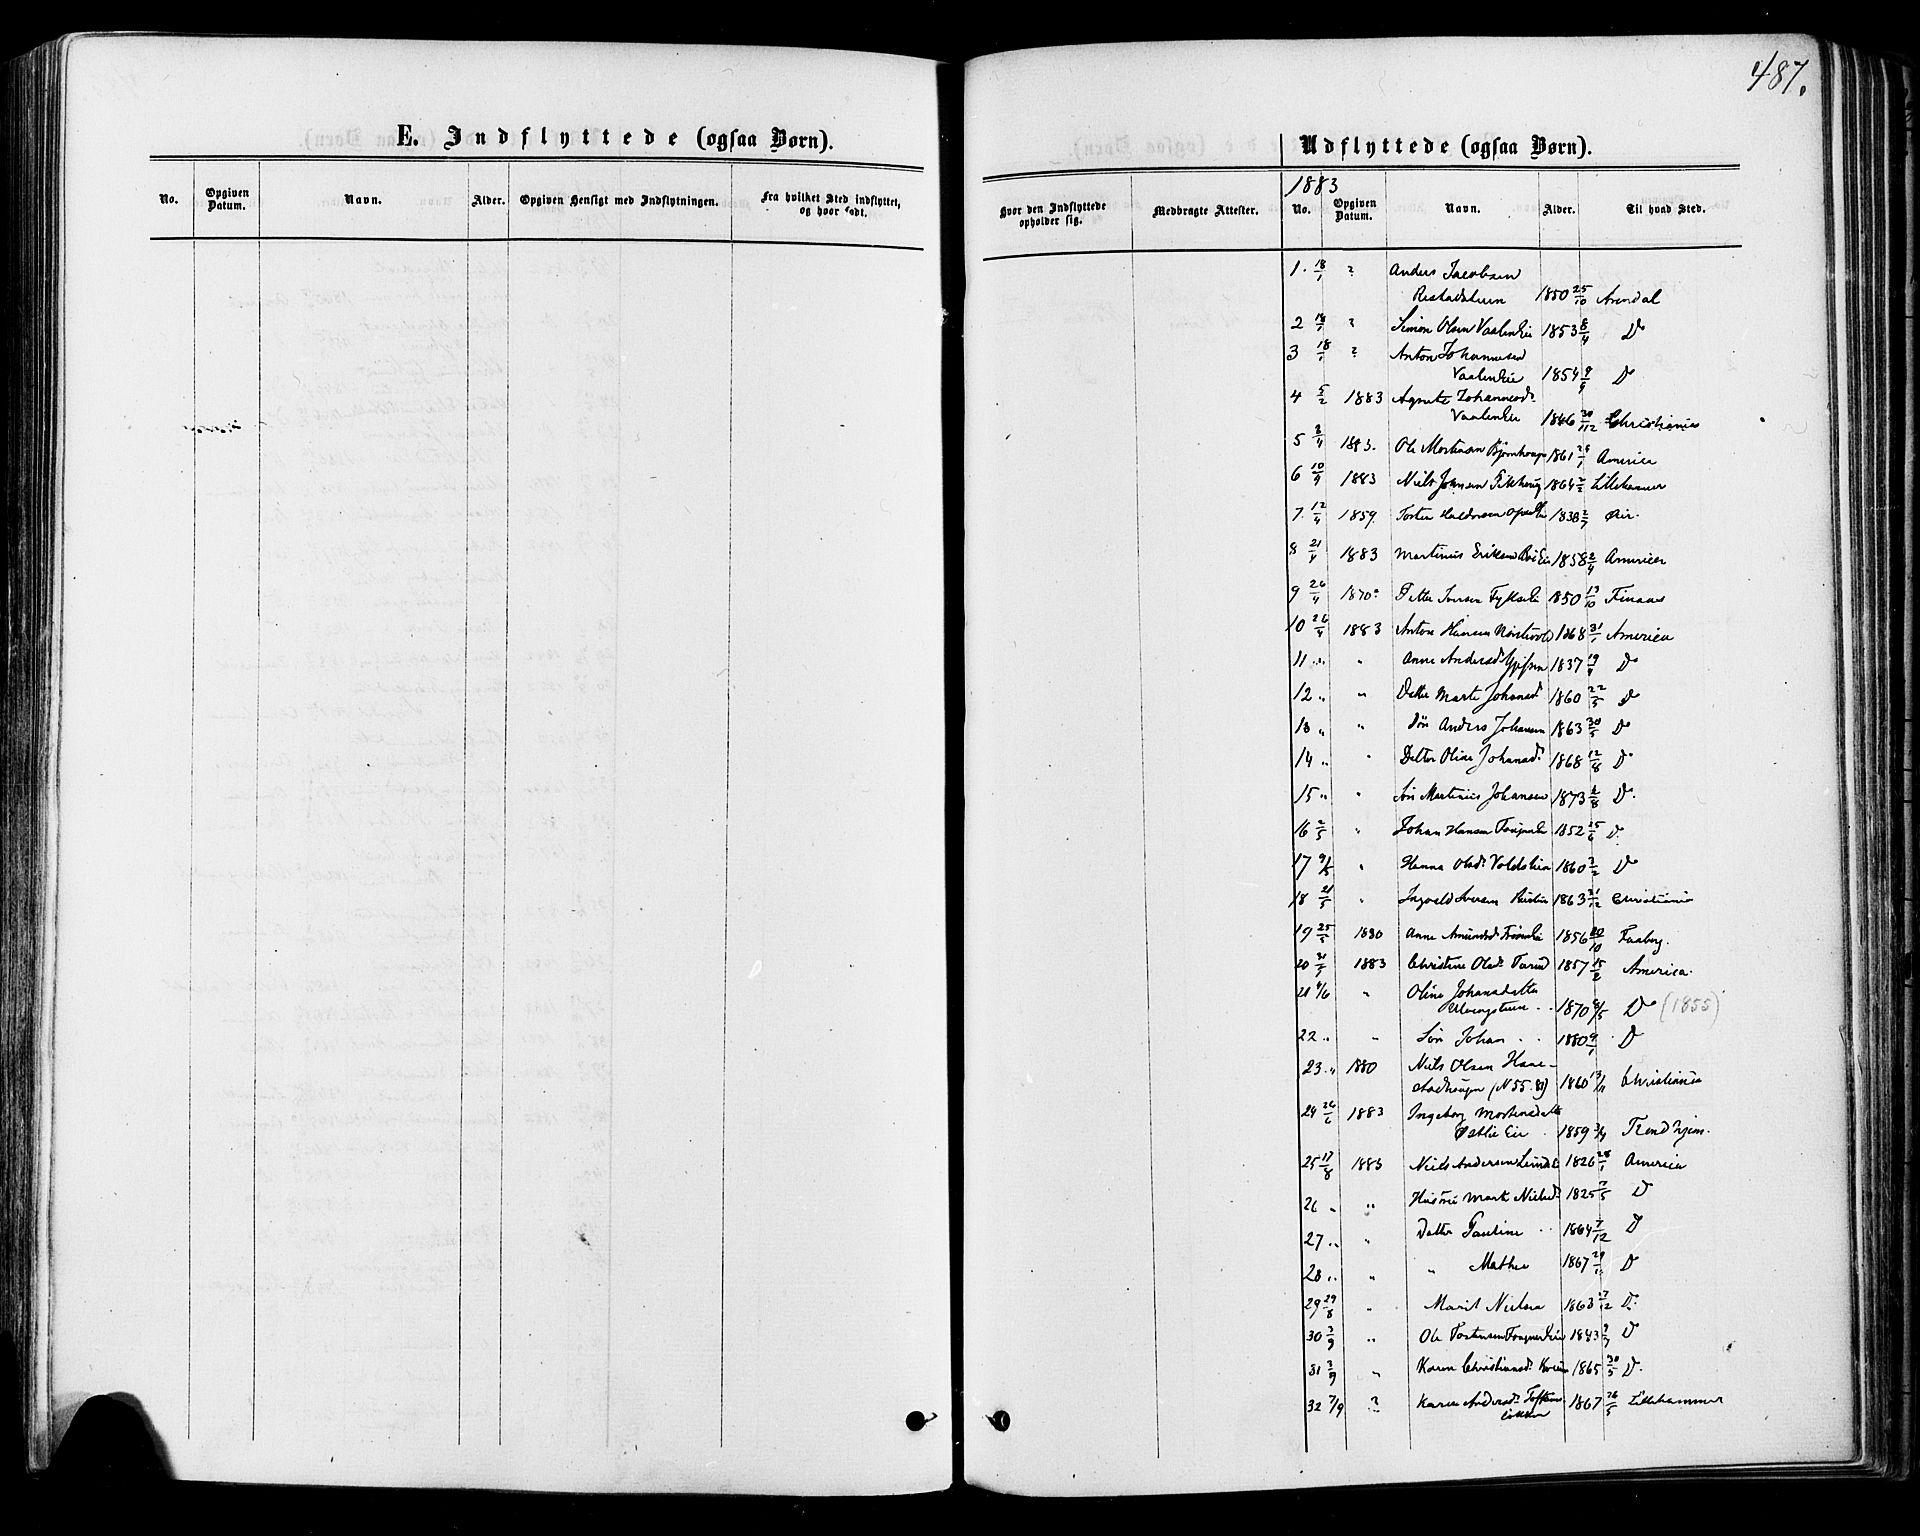 SAH, Østre Gausdal prestekontor, Ministerialbok nr. 1, 1874-1886, s. 487